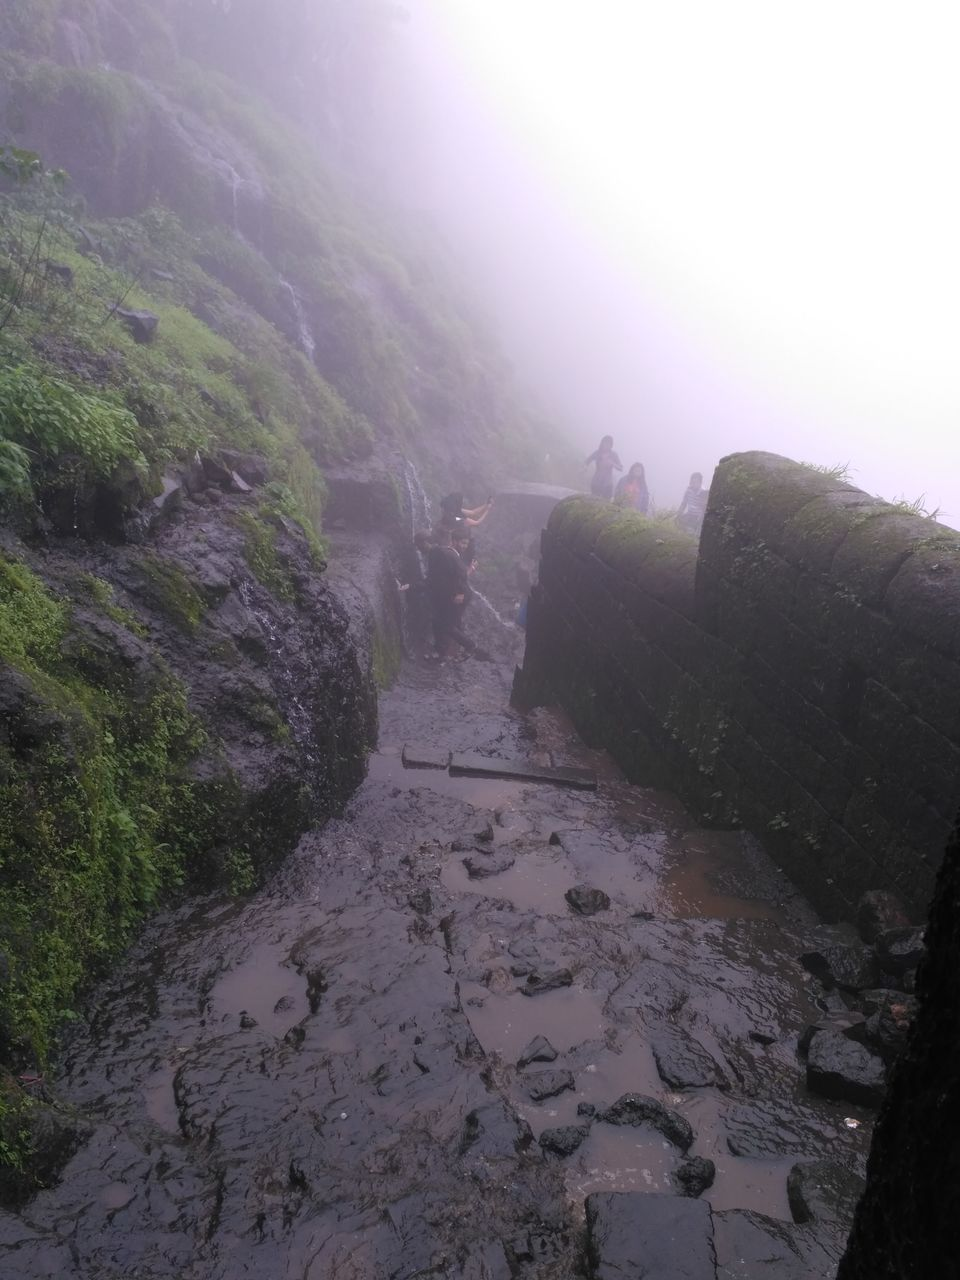 Photos of Lohagad Fort 1/1 by Prahlad Raj